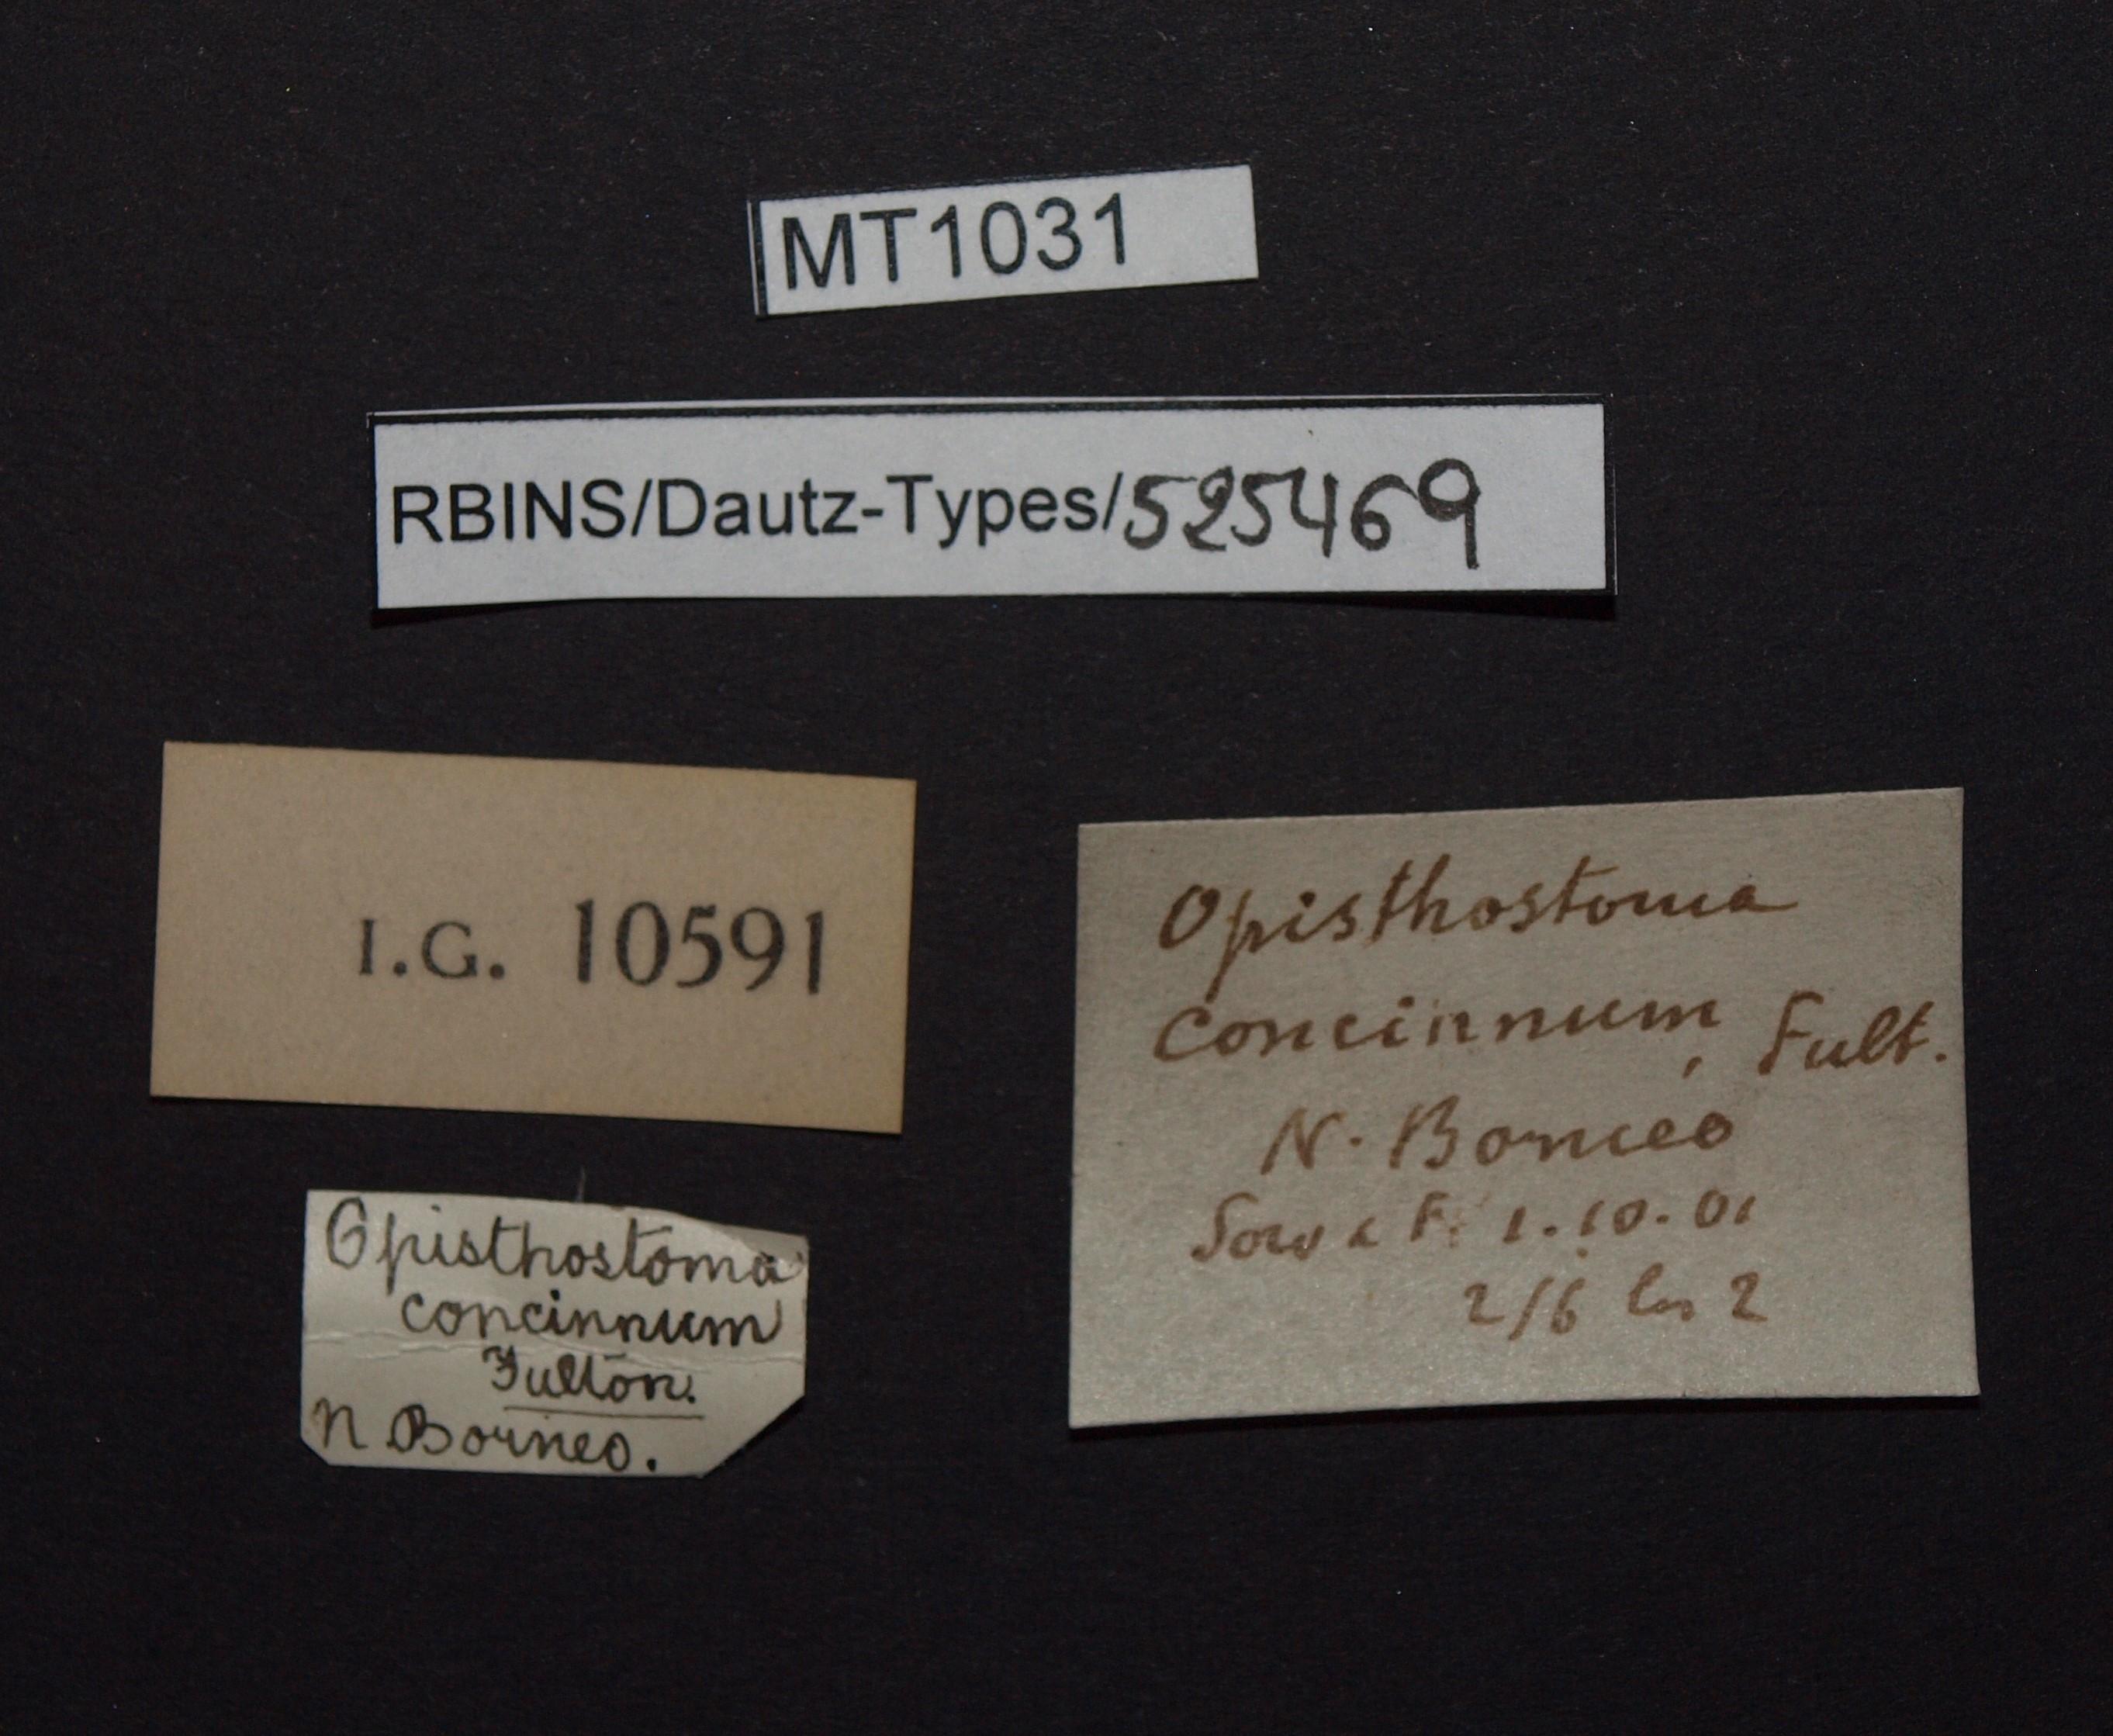 BE-RBINS-INV MT 1031 Opisthostoma (Geothauma) concinnum pt Lb.jpg